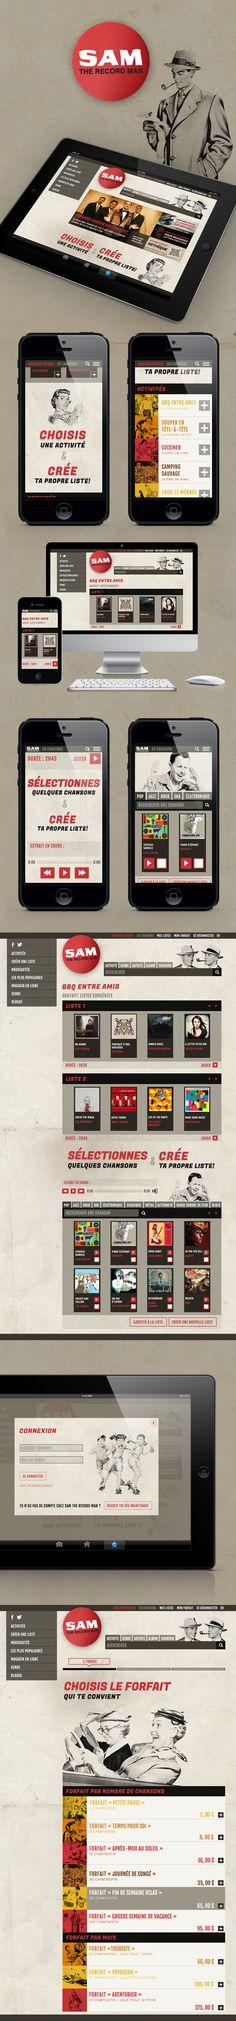 Sam the record man on Behance